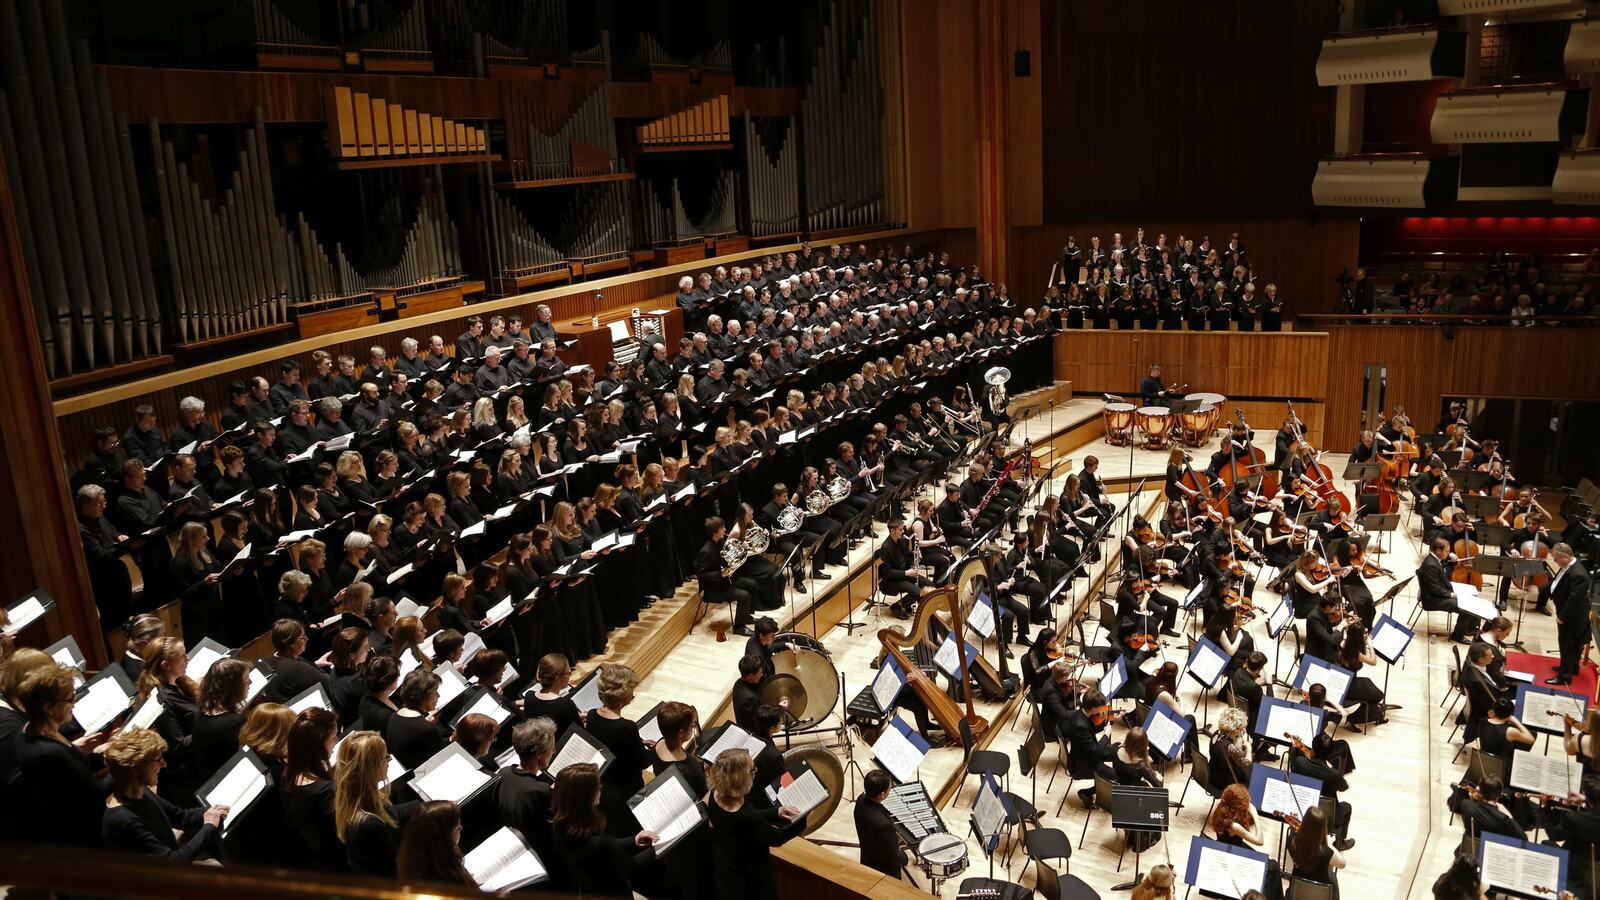 The Bach Choir on stage at Royal Festival Hall